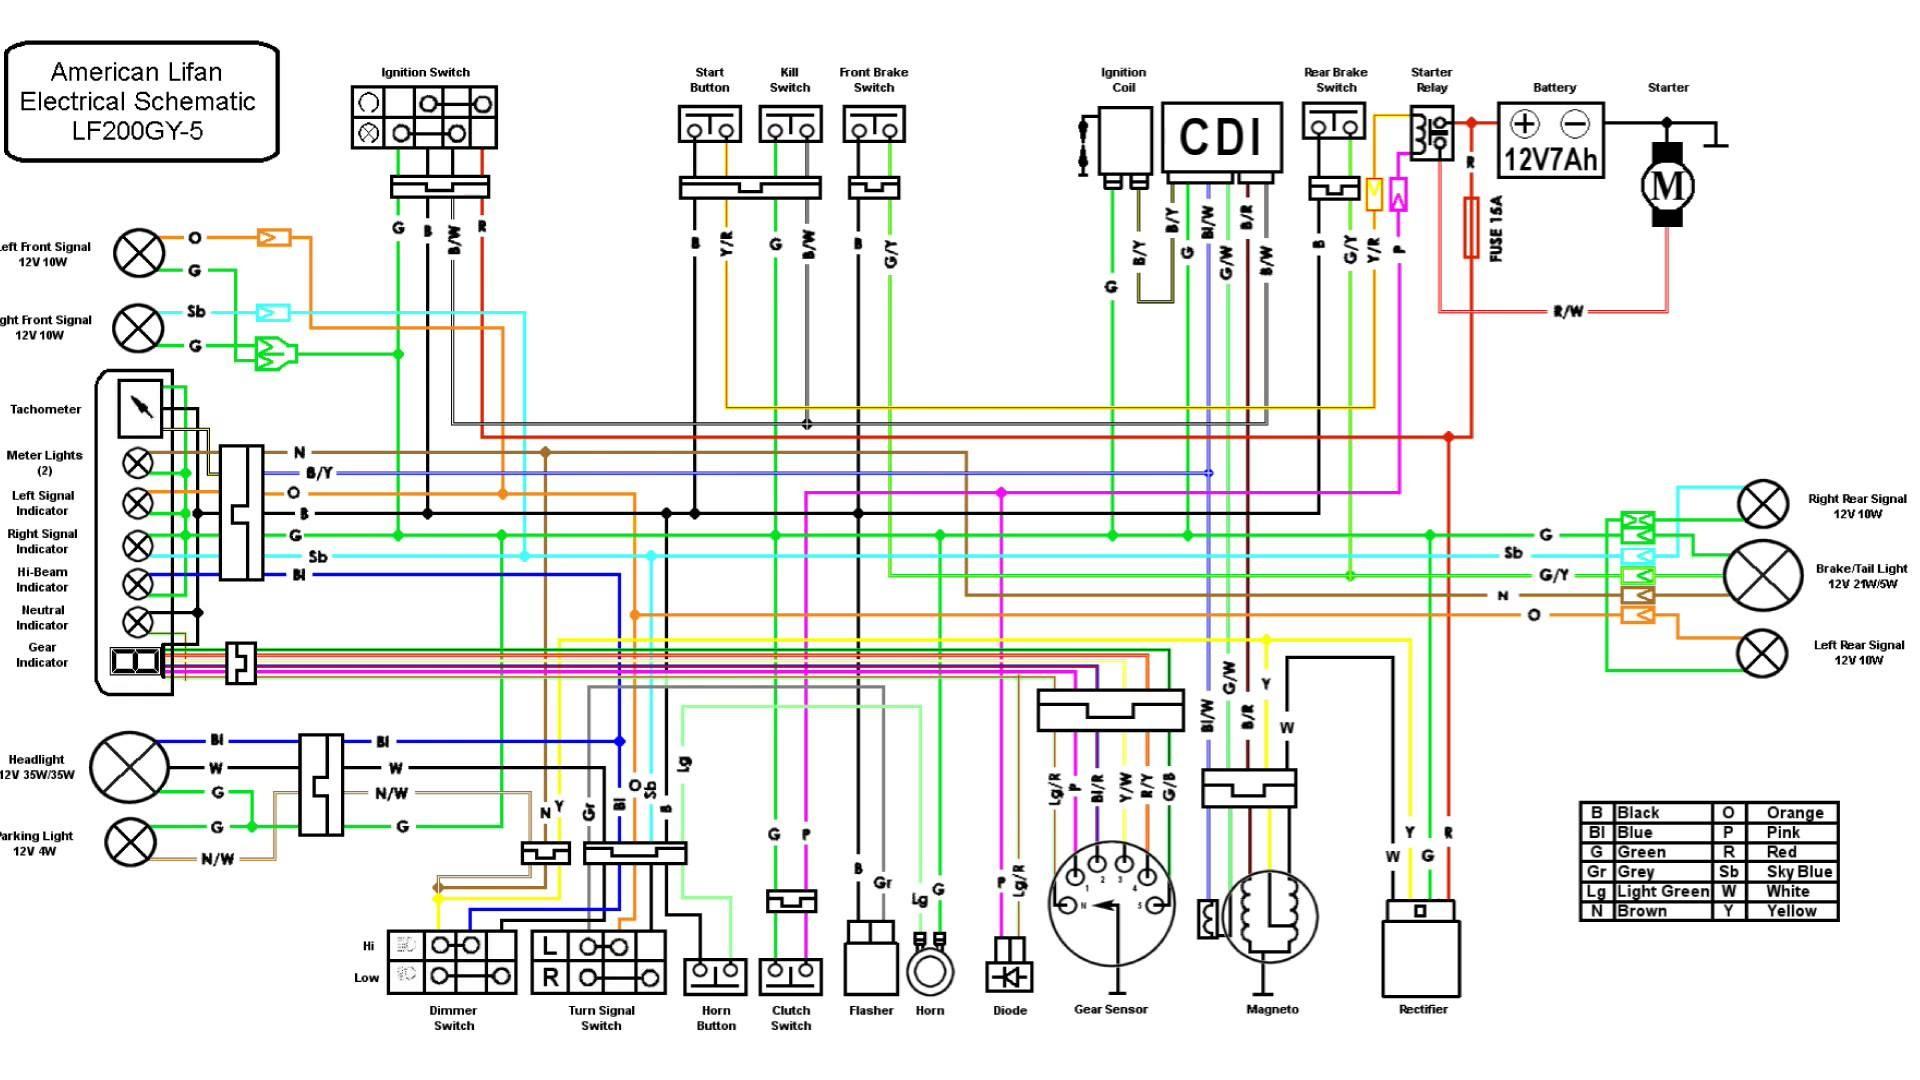 chinese 4 wheeler wiring diagram chinese atv wiring harness diagram rh detoxicrecenze com